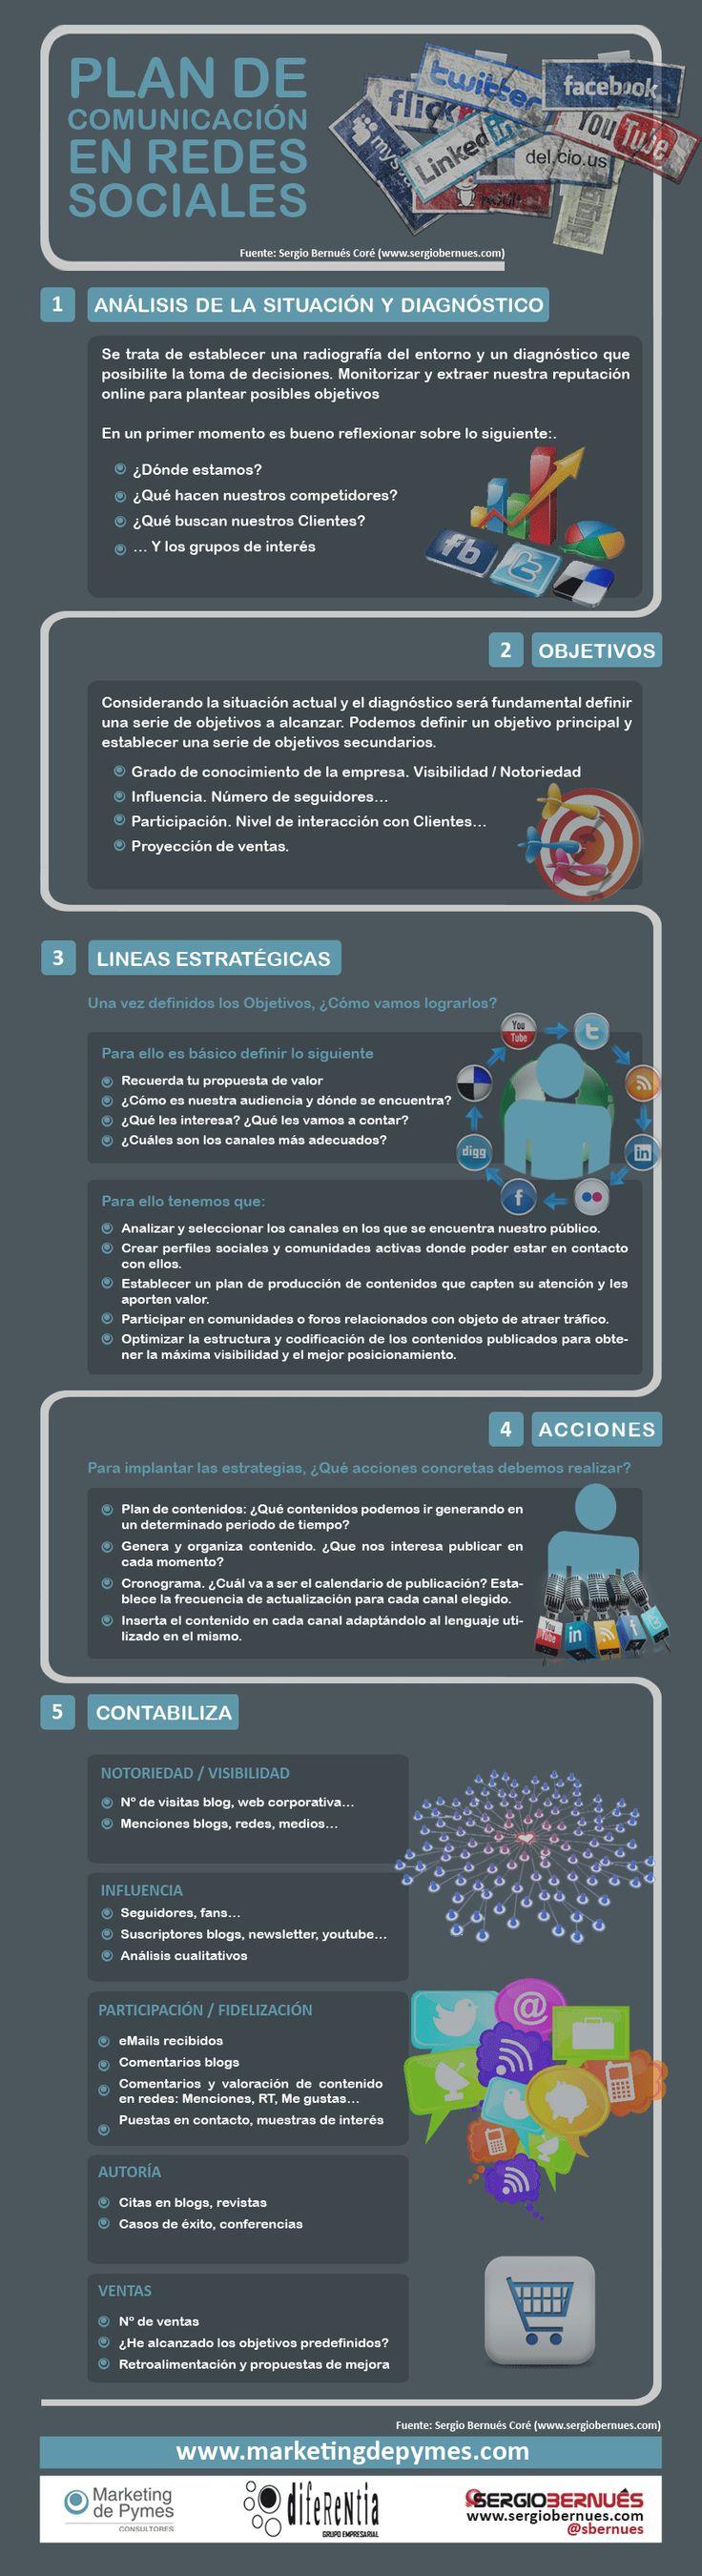 Plan de comunicación en redes sociales.